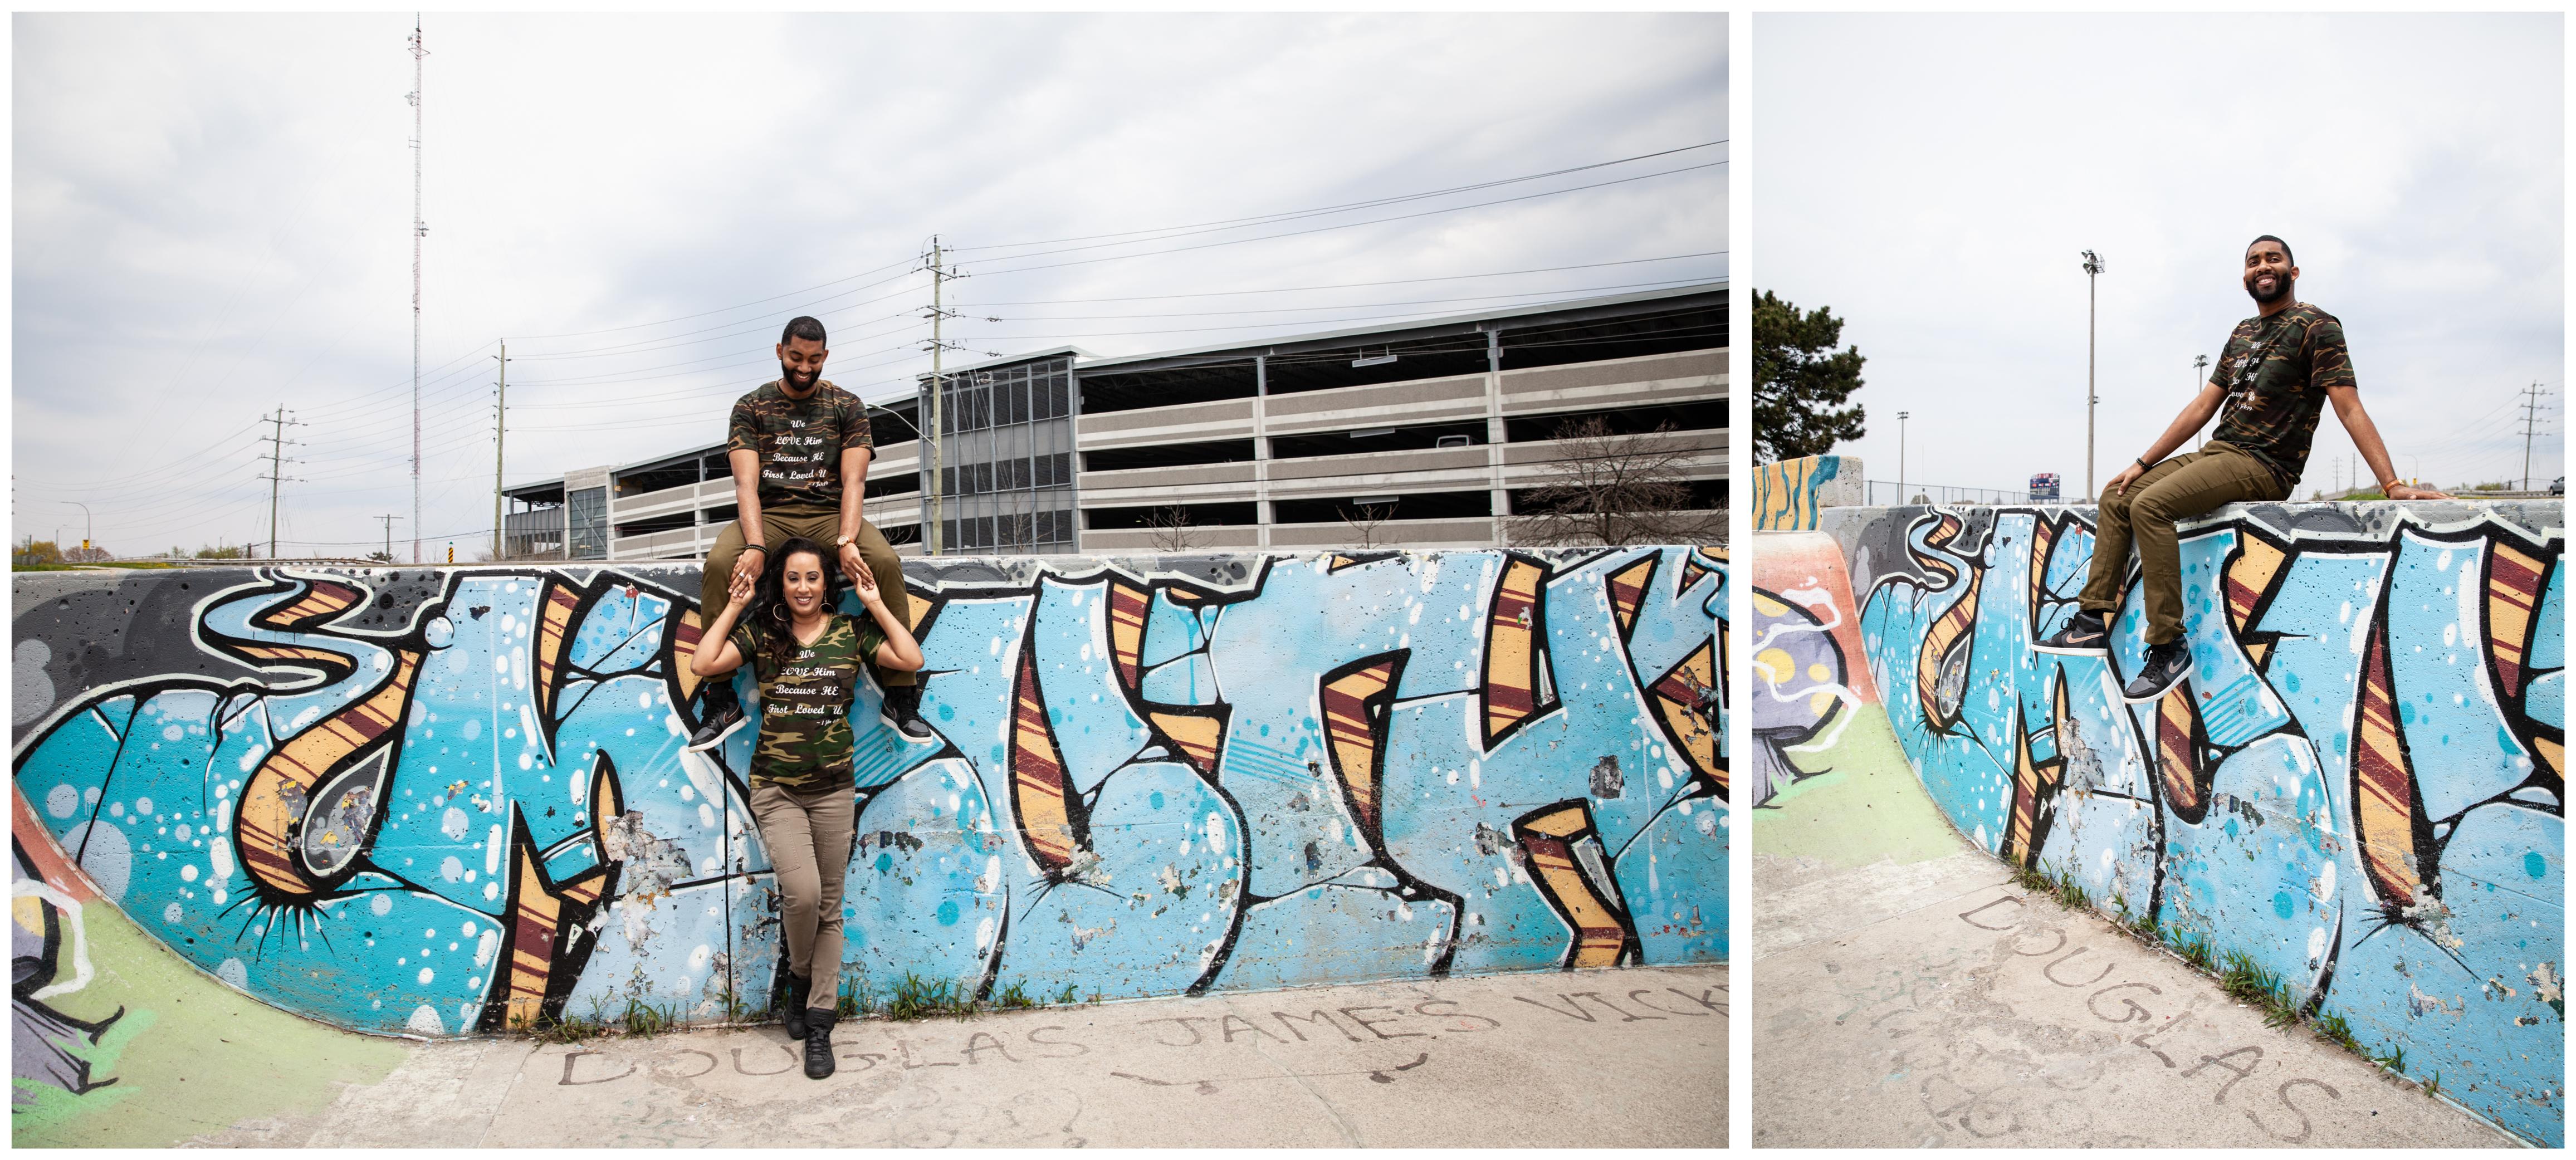 Skatepark Engagement photo session in Whitby